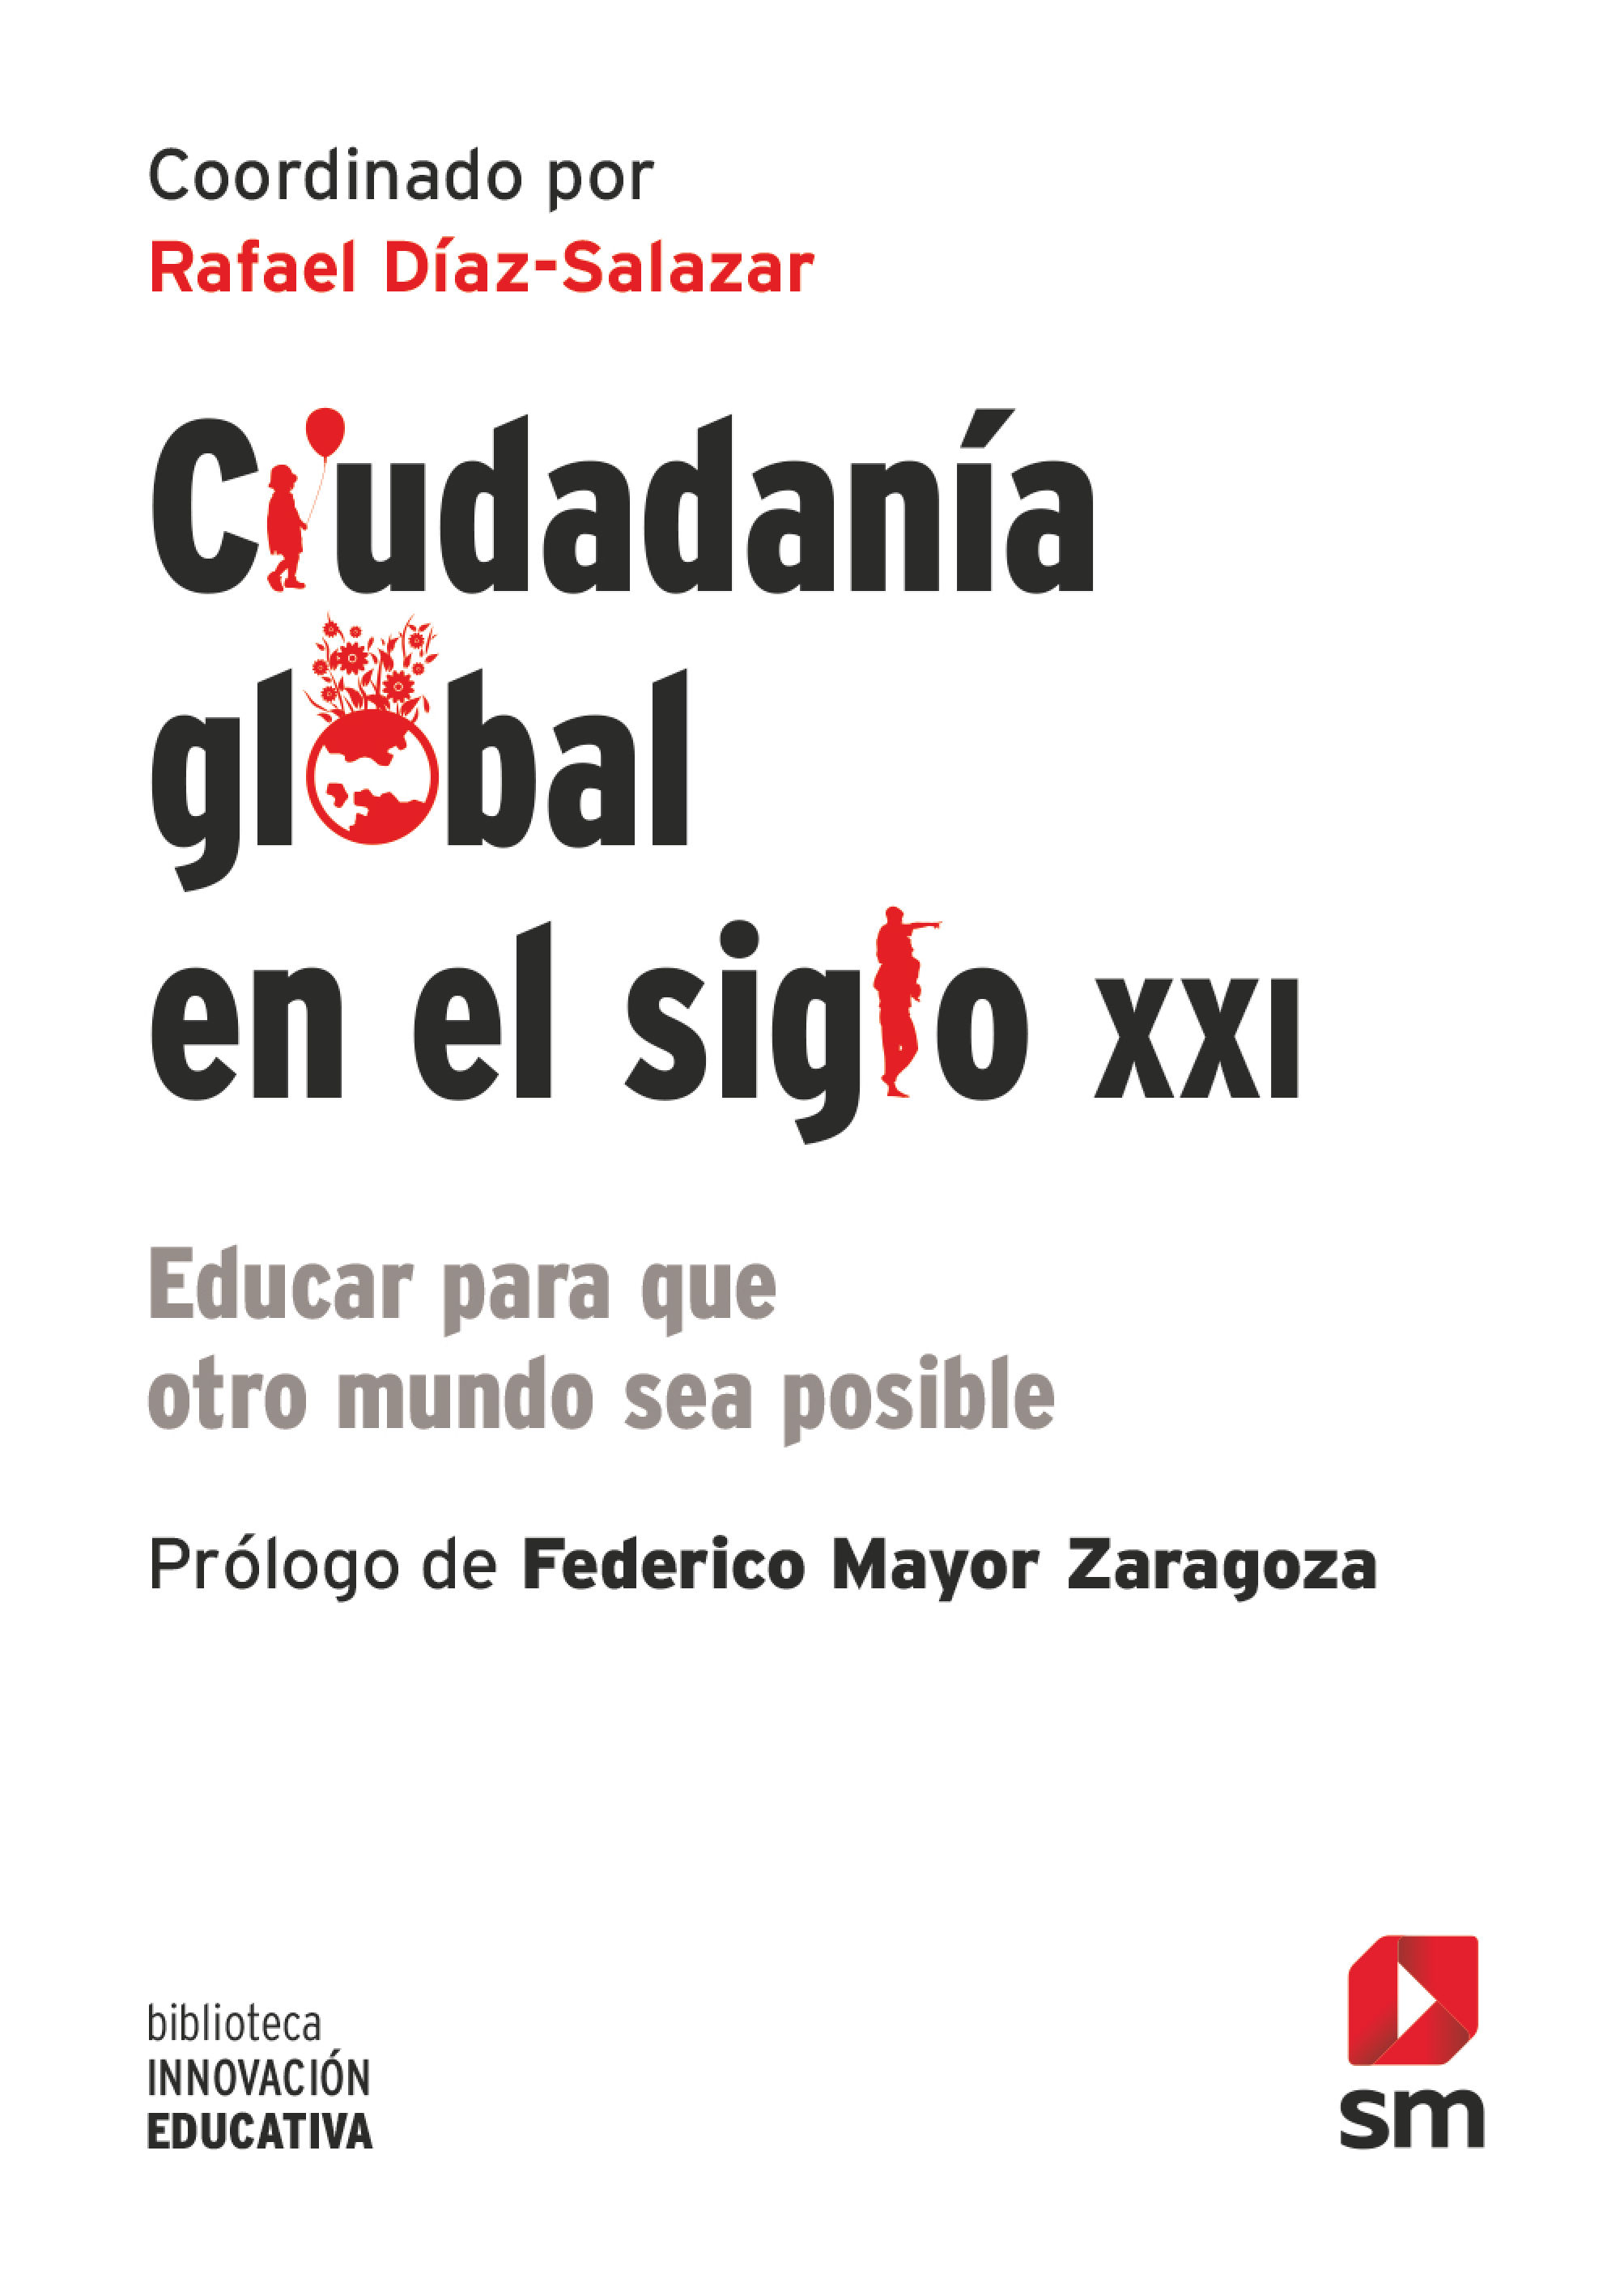 CIUDADANIA GLOBAL EN EL SIGLO XXI